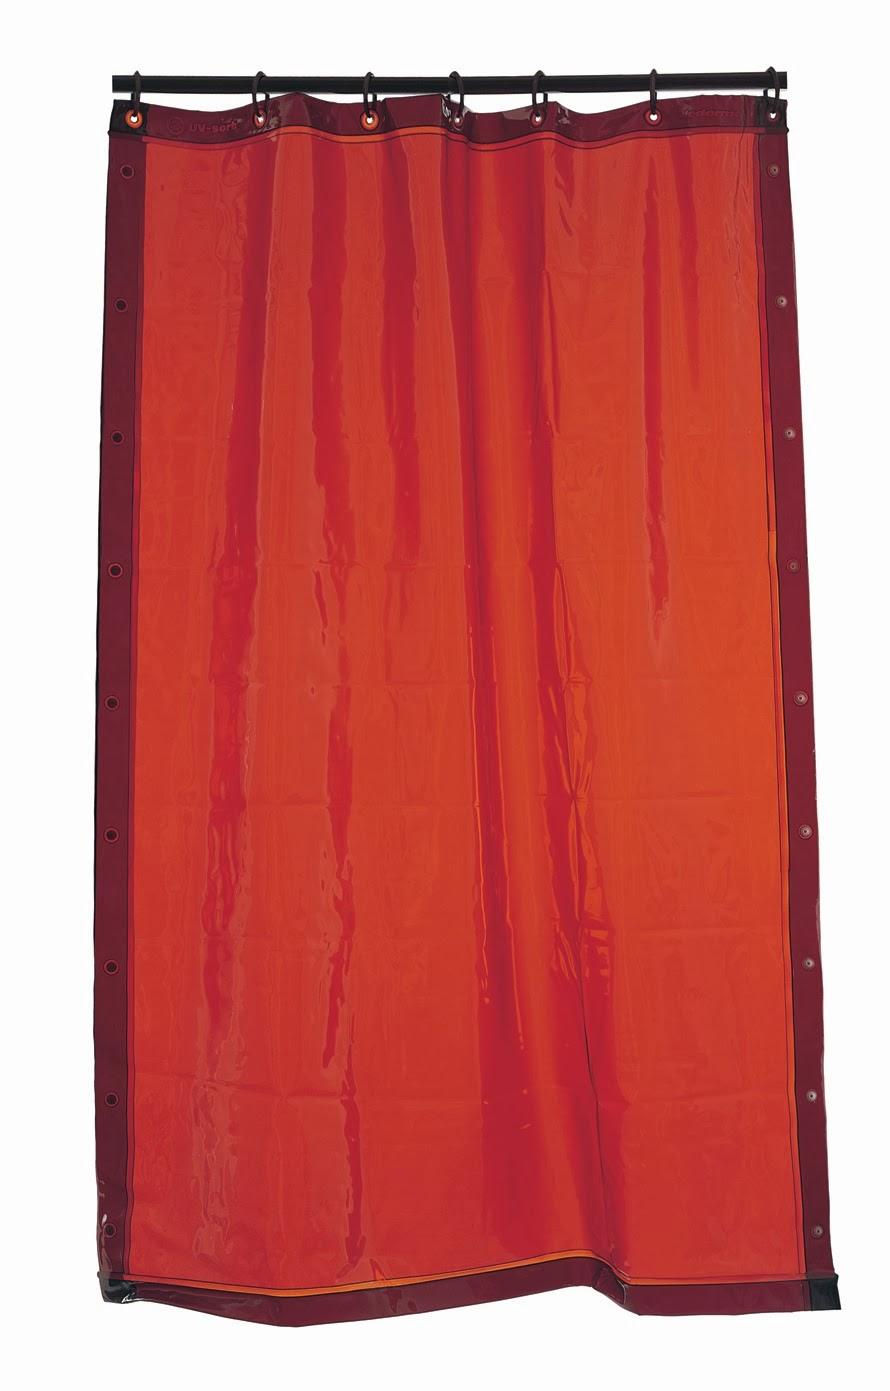 welding_curtain_red_opaque_23152666940_o.jpg